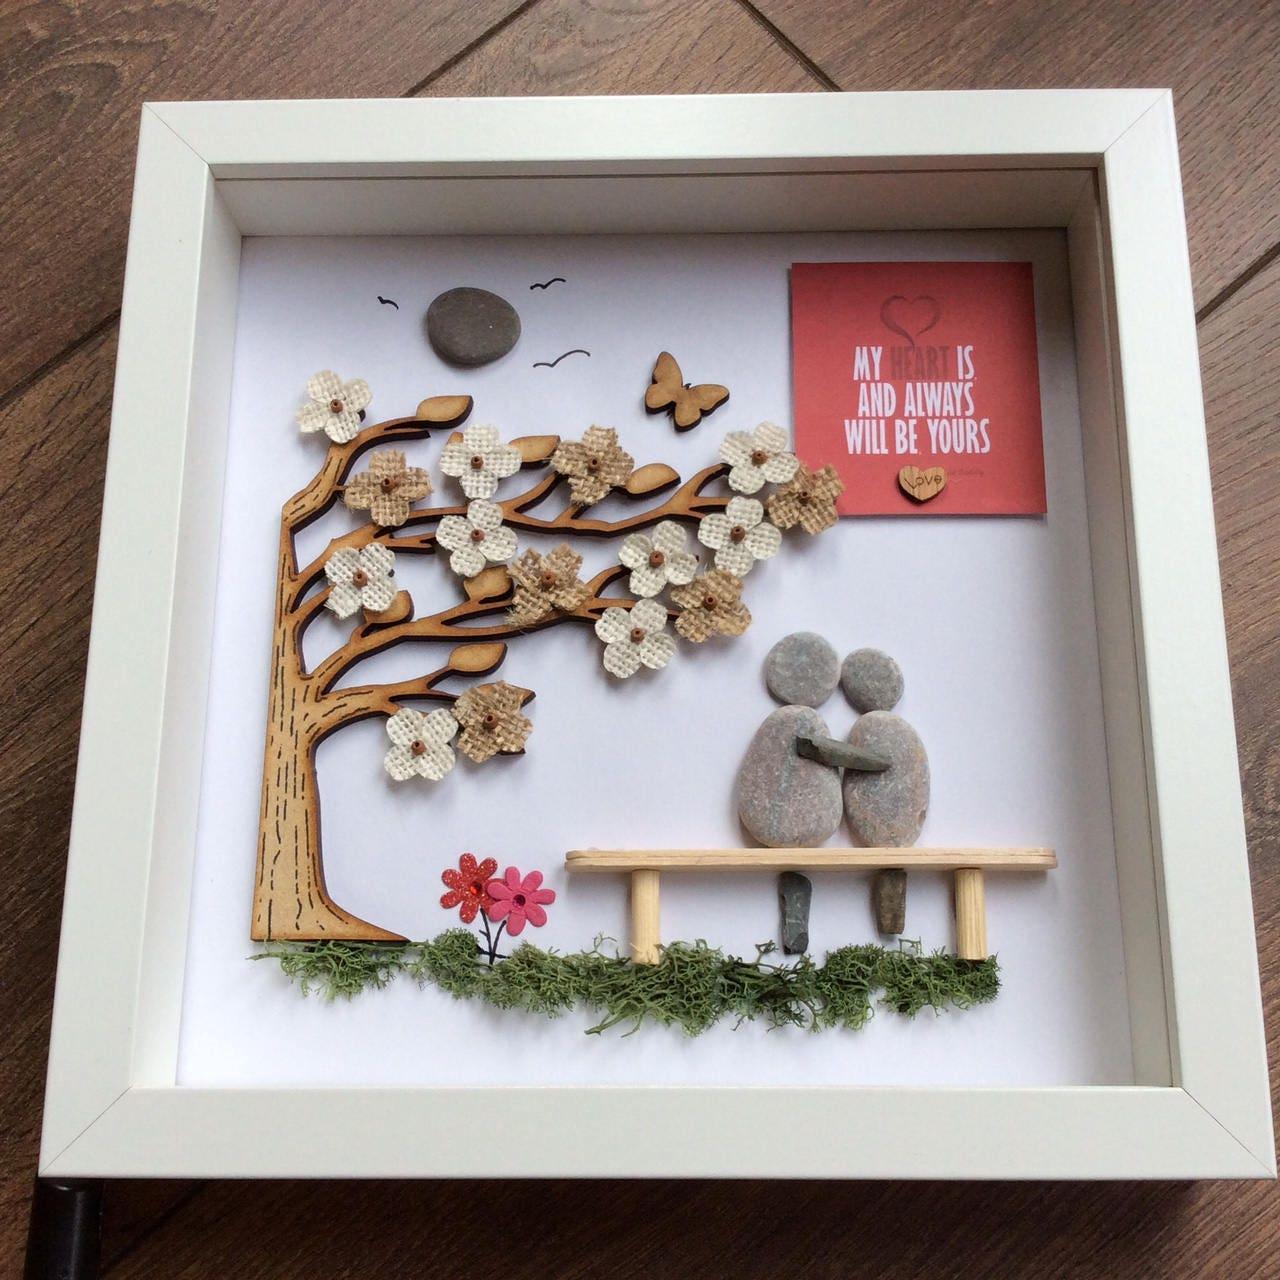 Etsy Wedding Gifts: Pebble Art Wedding Gift For Him Gift For Couple Wall Art